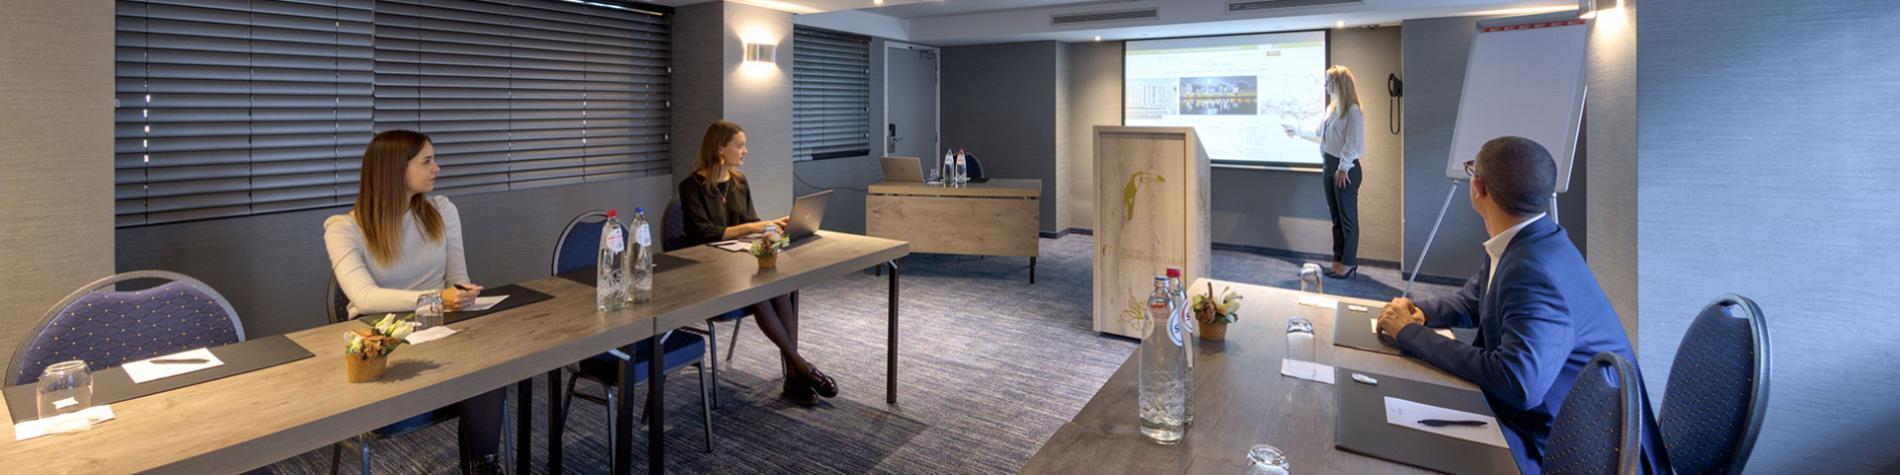 Congres - Hotel - Van der Valk - Mons